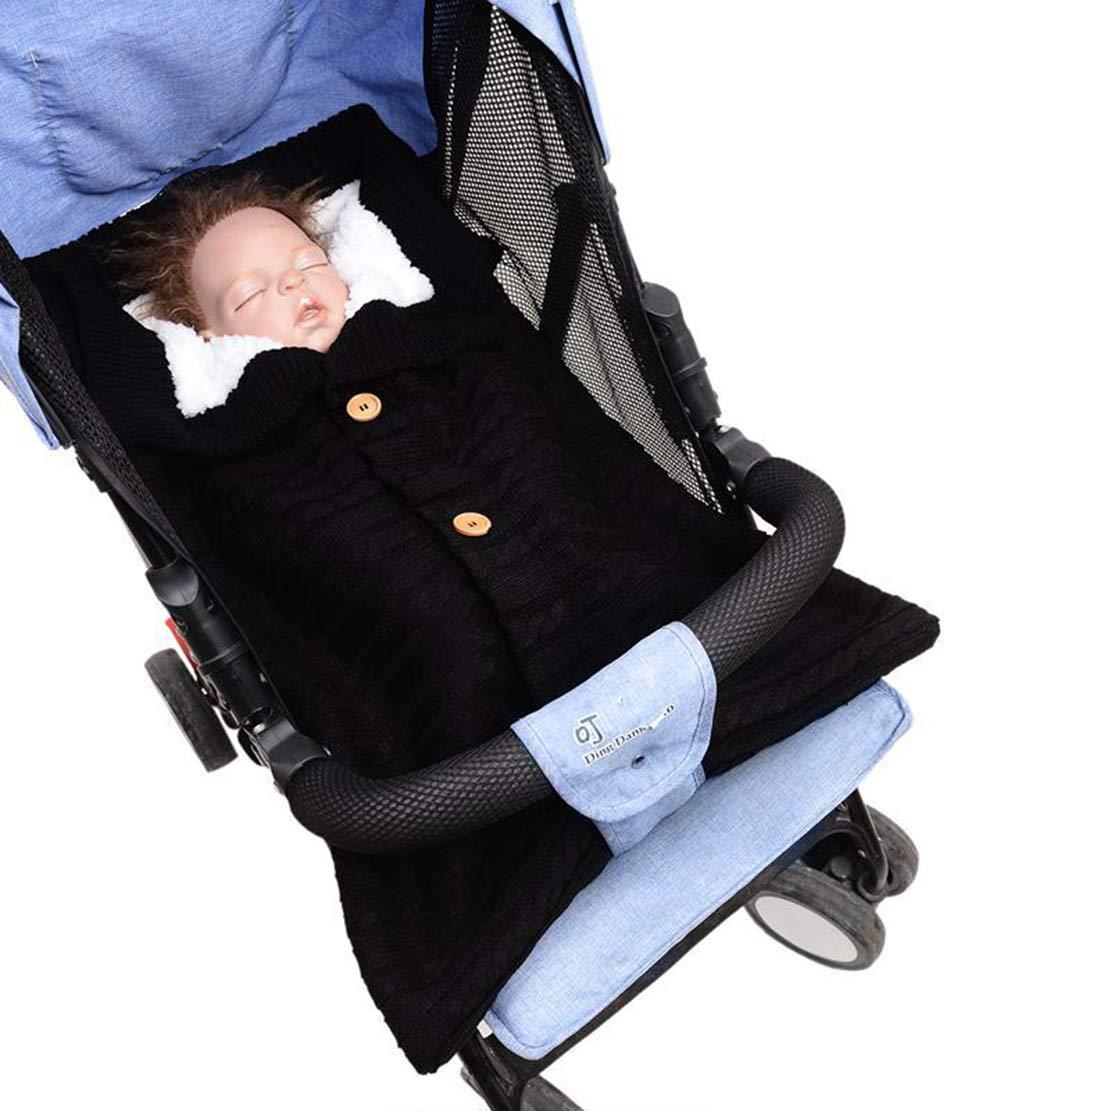 Mantas Envolventes Saco de Dormir de Punto Felpa Unisex Swaddle Blanket Beb/é Reci/én Nacido de 0-6 Meses para Cochecito Invierno Caliente C/ómodo